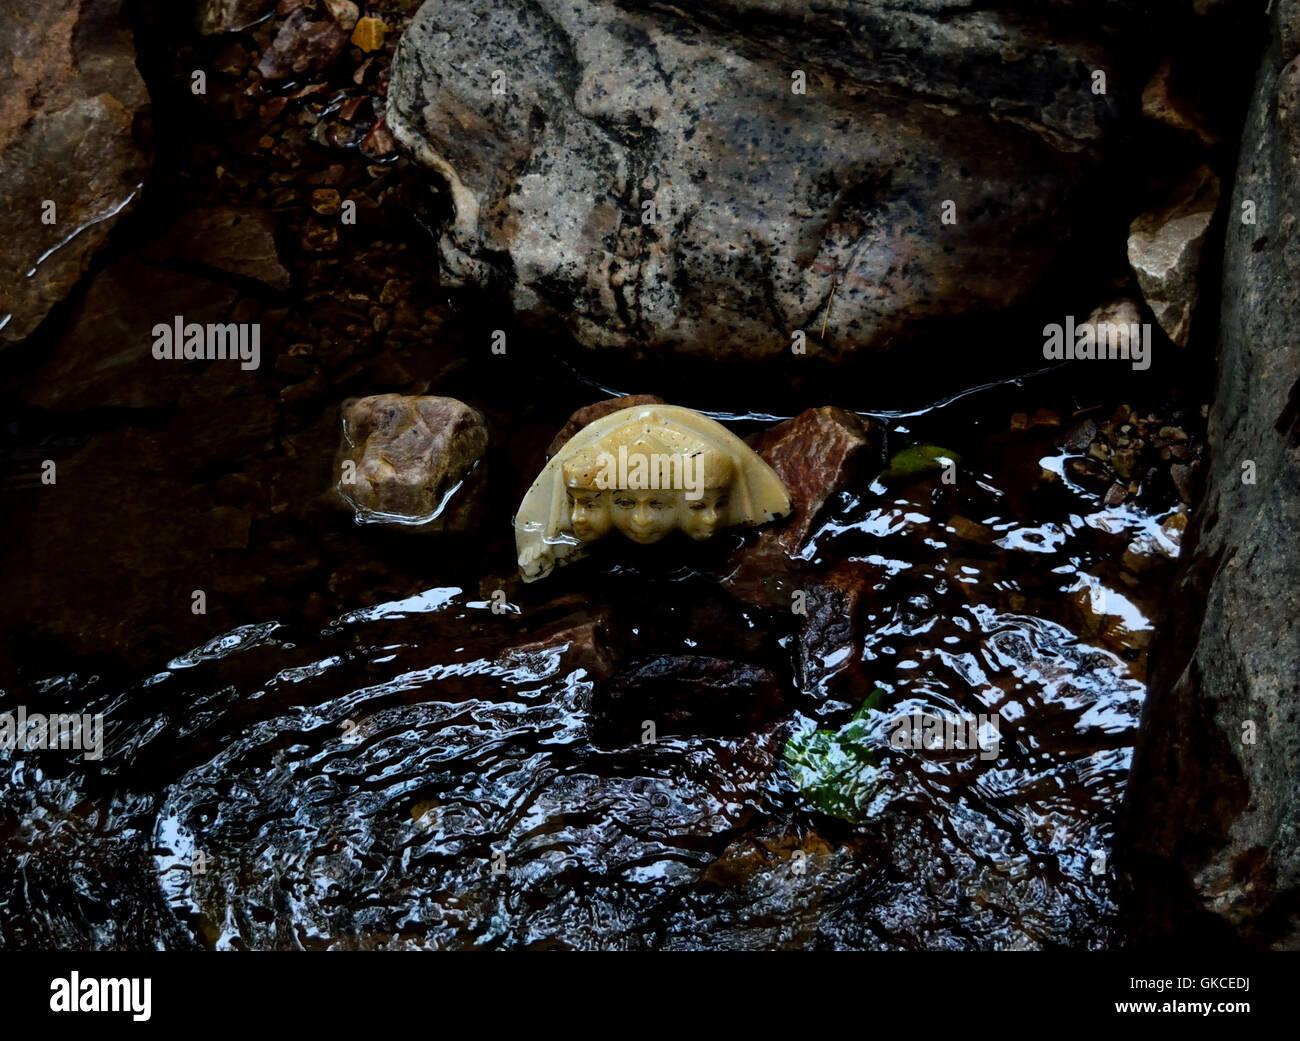 A desecrated Hindu marble idol with three heads lying in the Garvaji waterfall in Alwar Rajasthan India - Stock Image